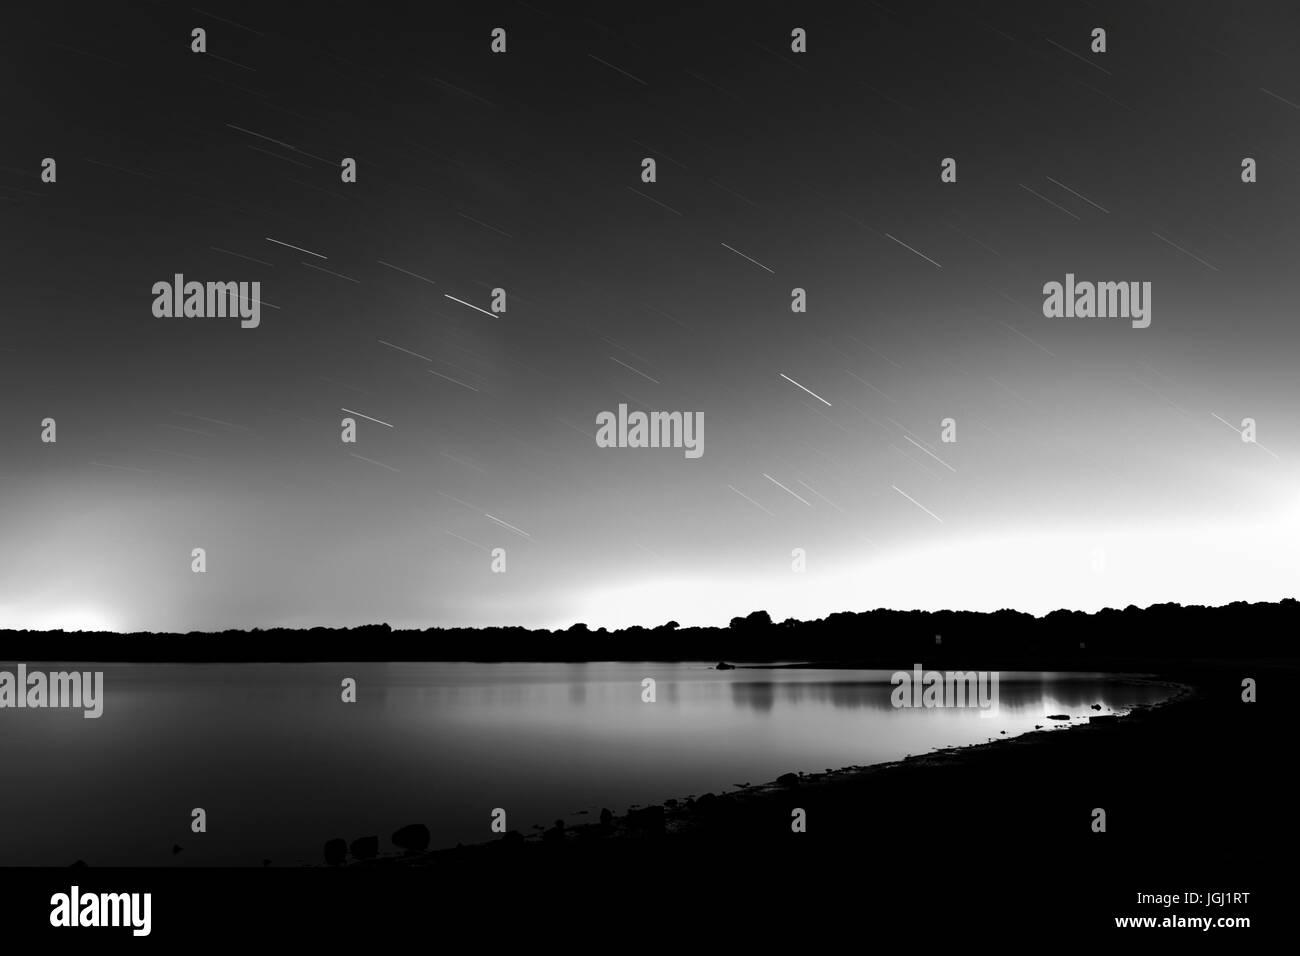 Lago del Saler. - Stock Image